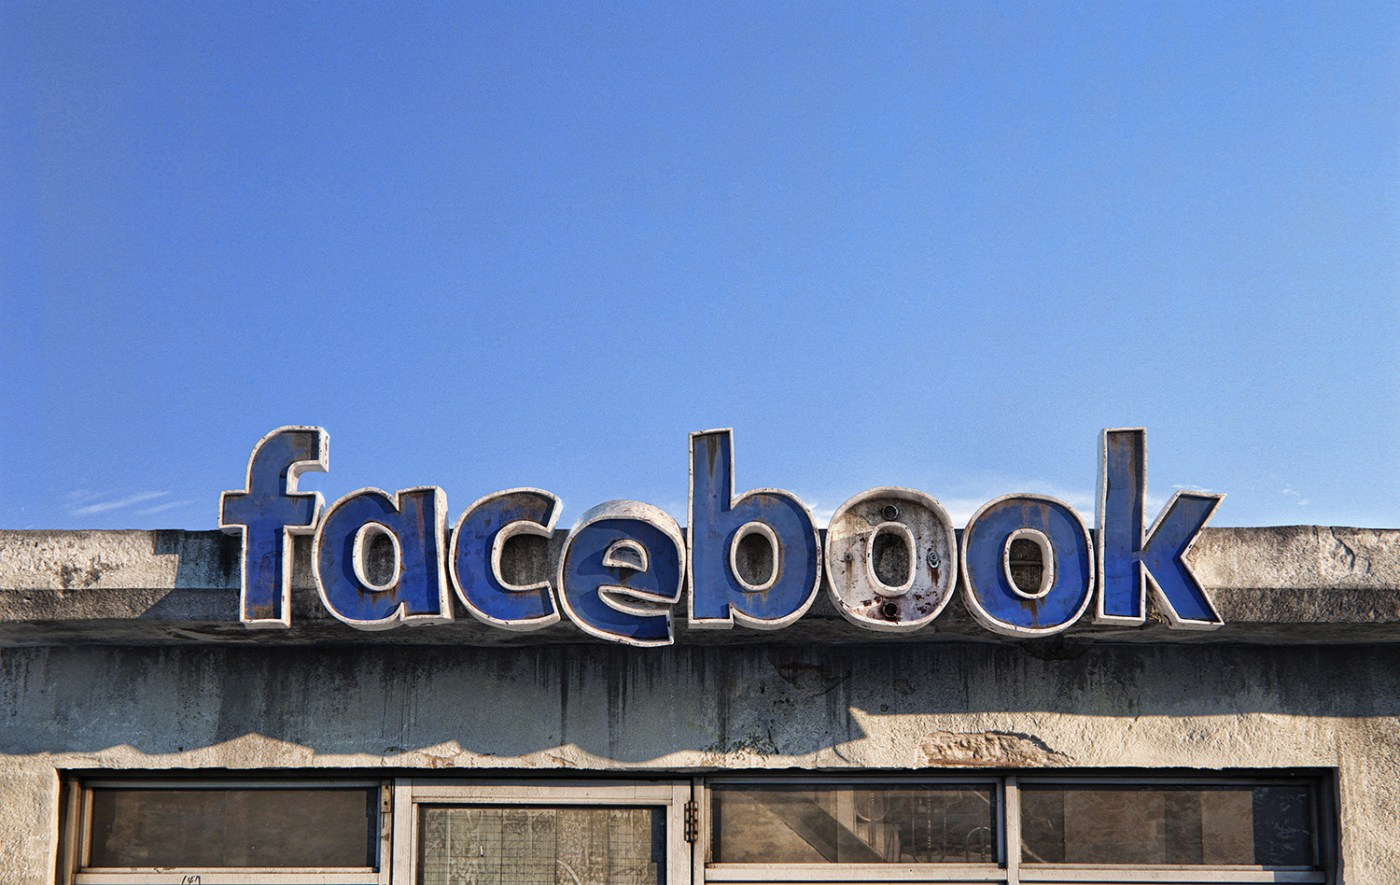 AndreiLacatusu social decay lettres logo enseigne typographie urbain urbex facebook - Social decay : les logos de Twitter, Facebook et Tinder transformés en enseignes vintage